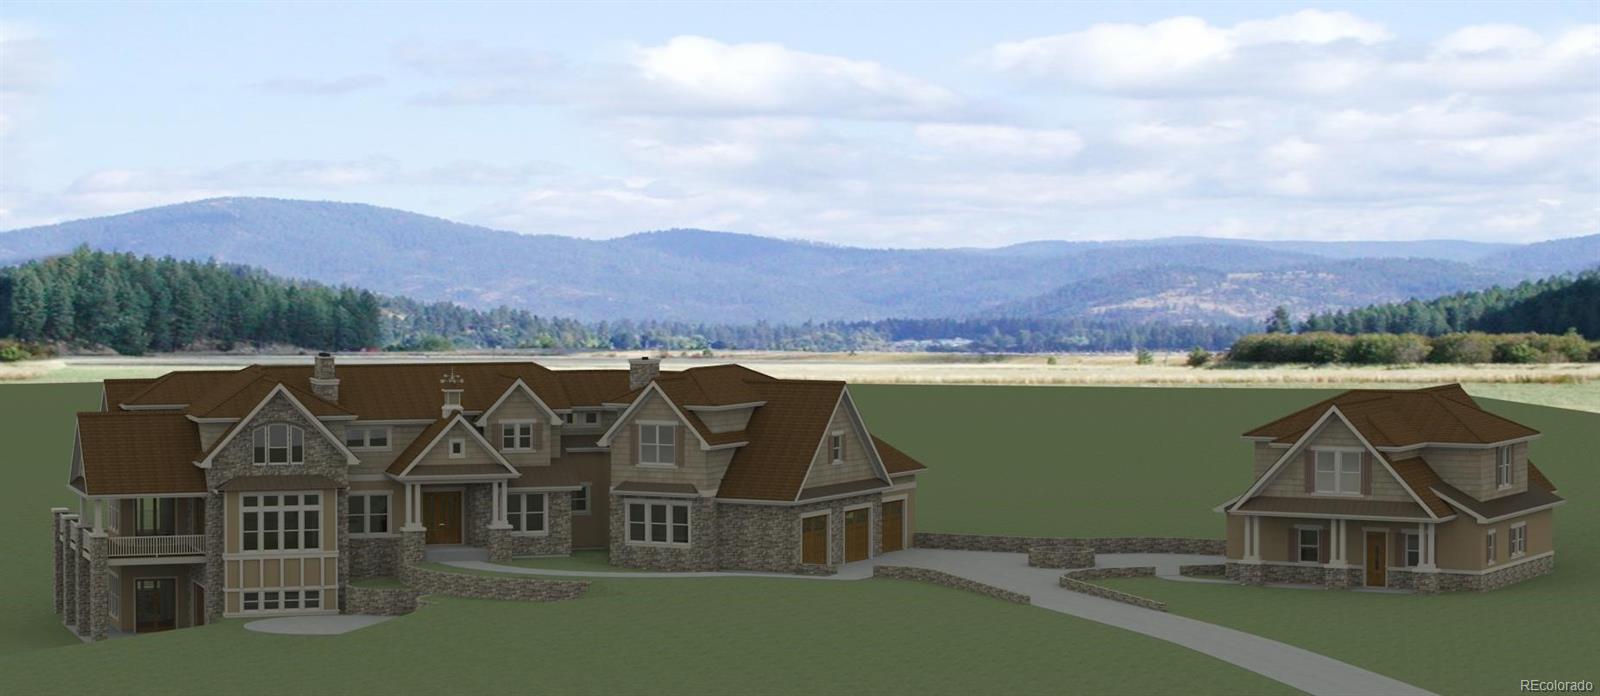 17818 Keller Drive, Berthoud, CO 80513 - Berthoud, CO real estate listing